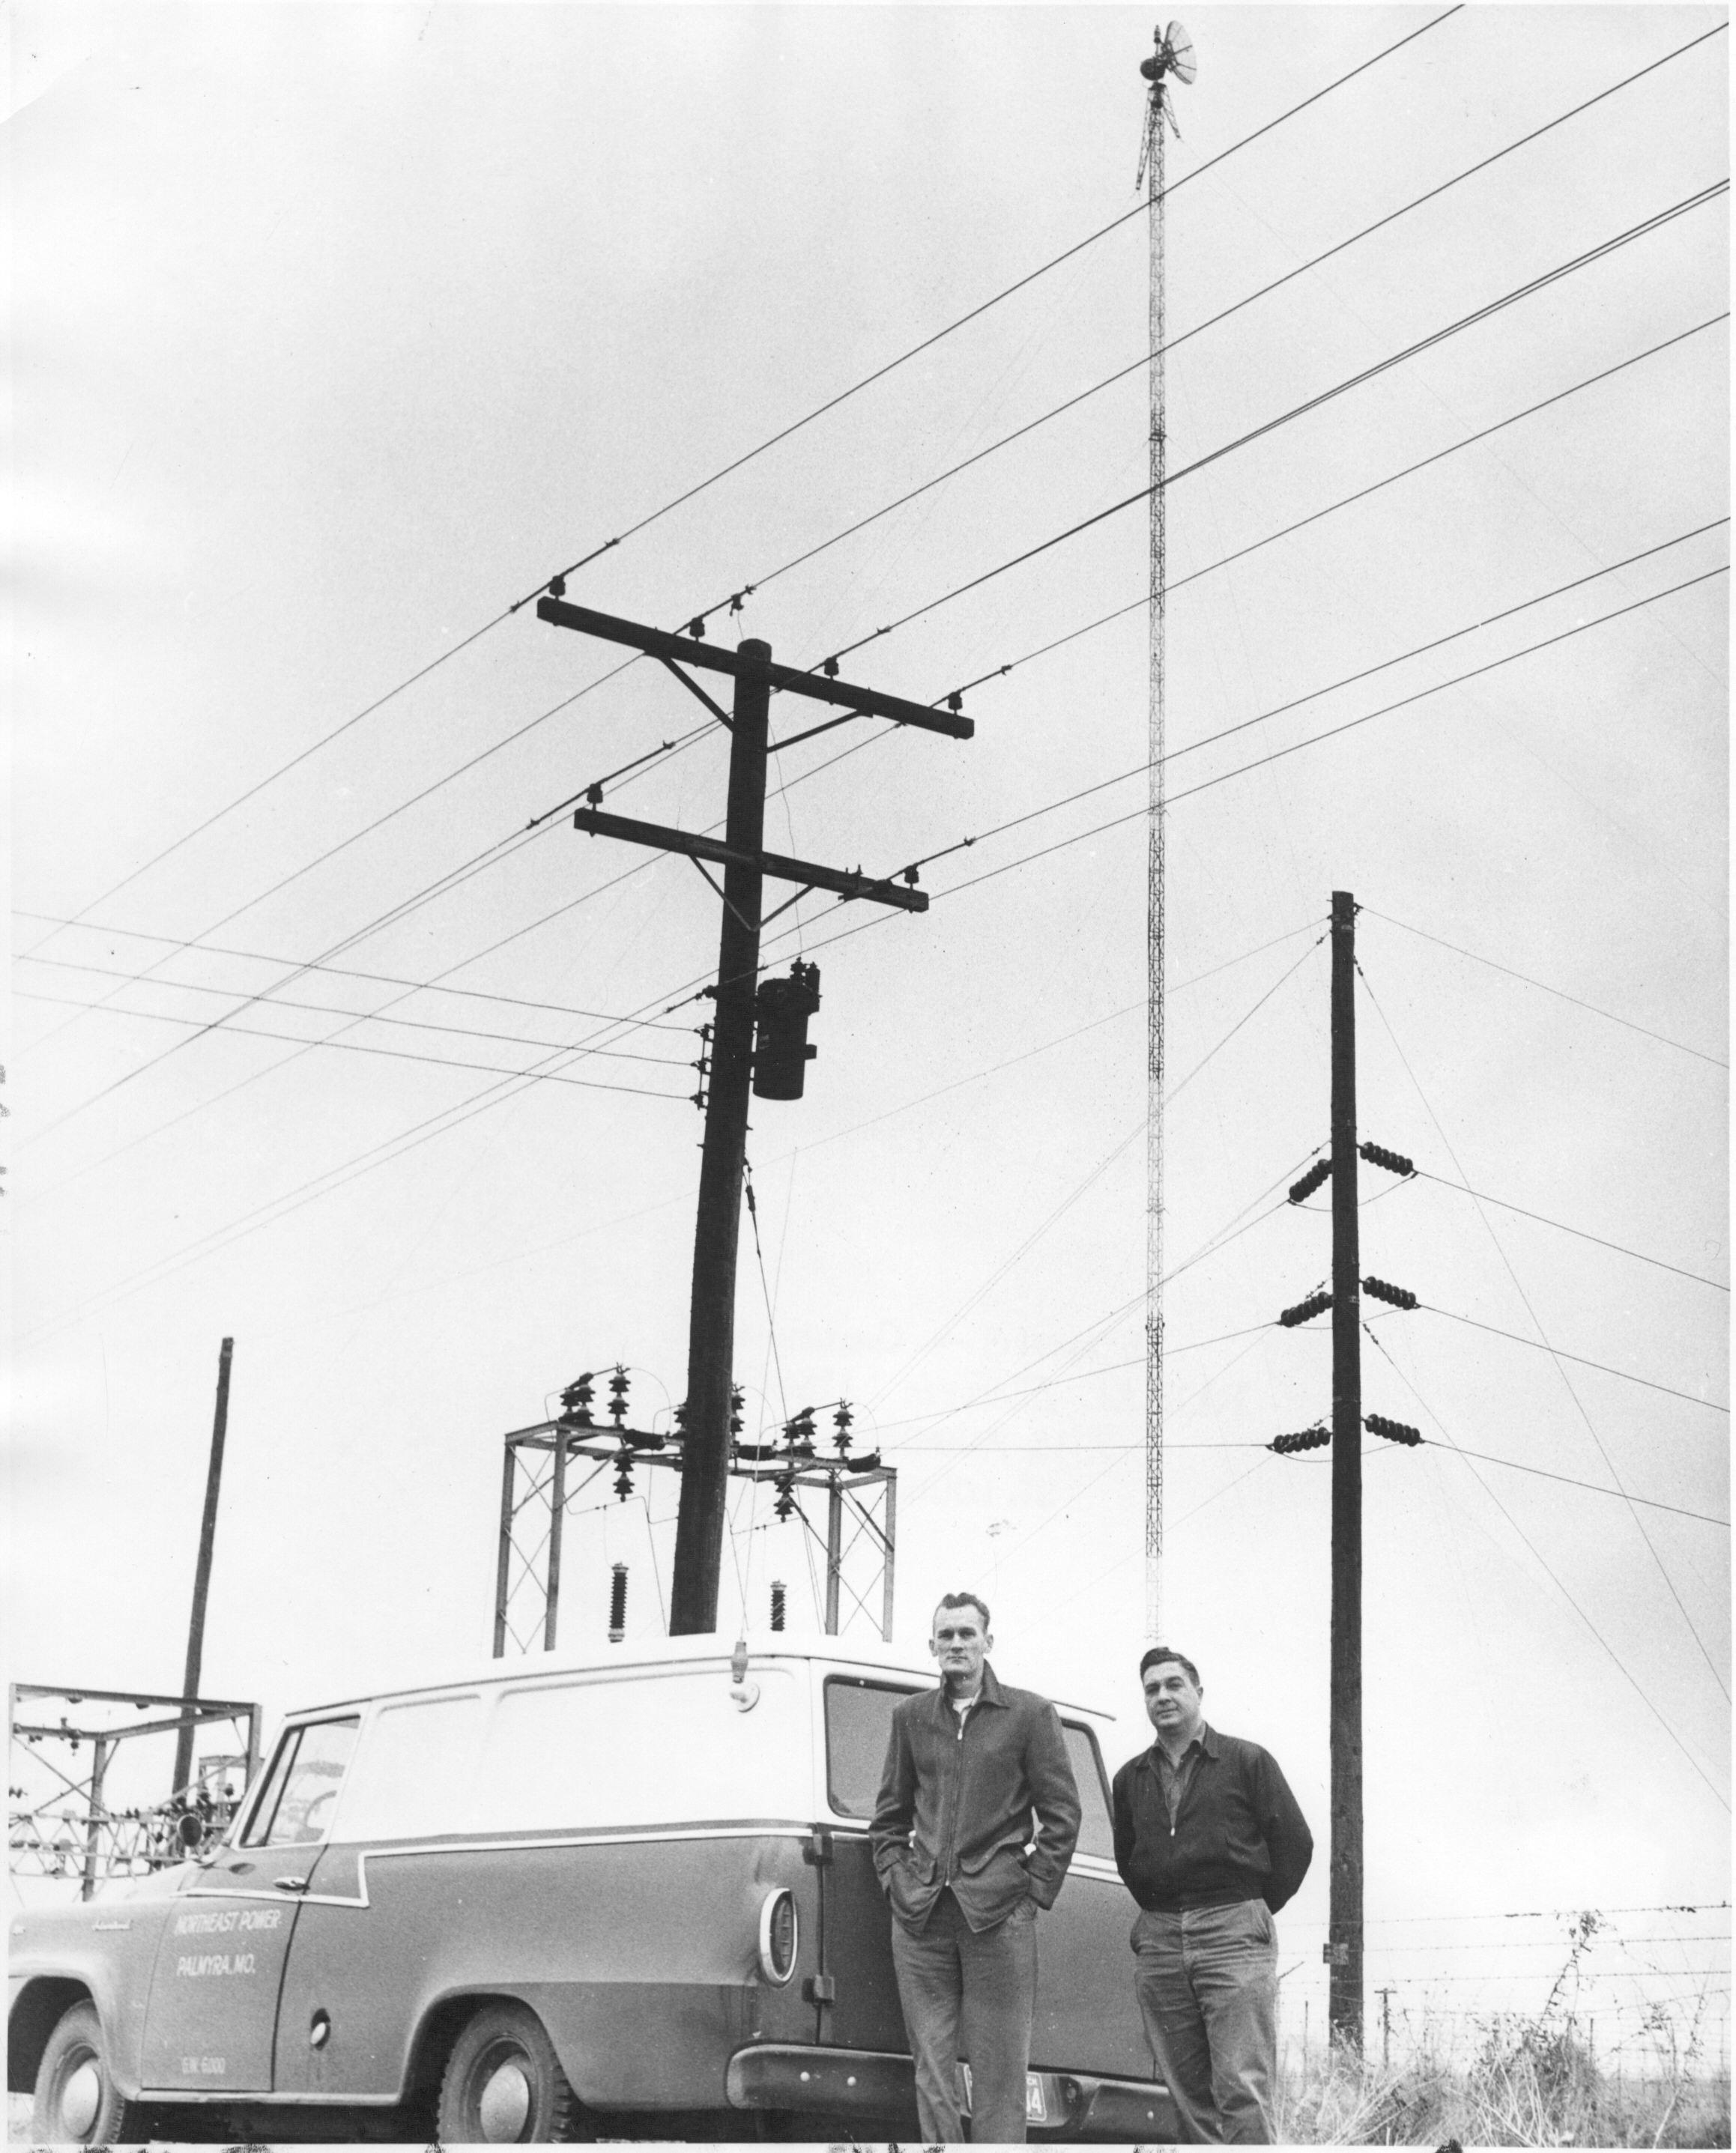 https://www.northeast-power.coop/sites/northeastpower/files/revslider/image/Bob%20Calvert.jpg